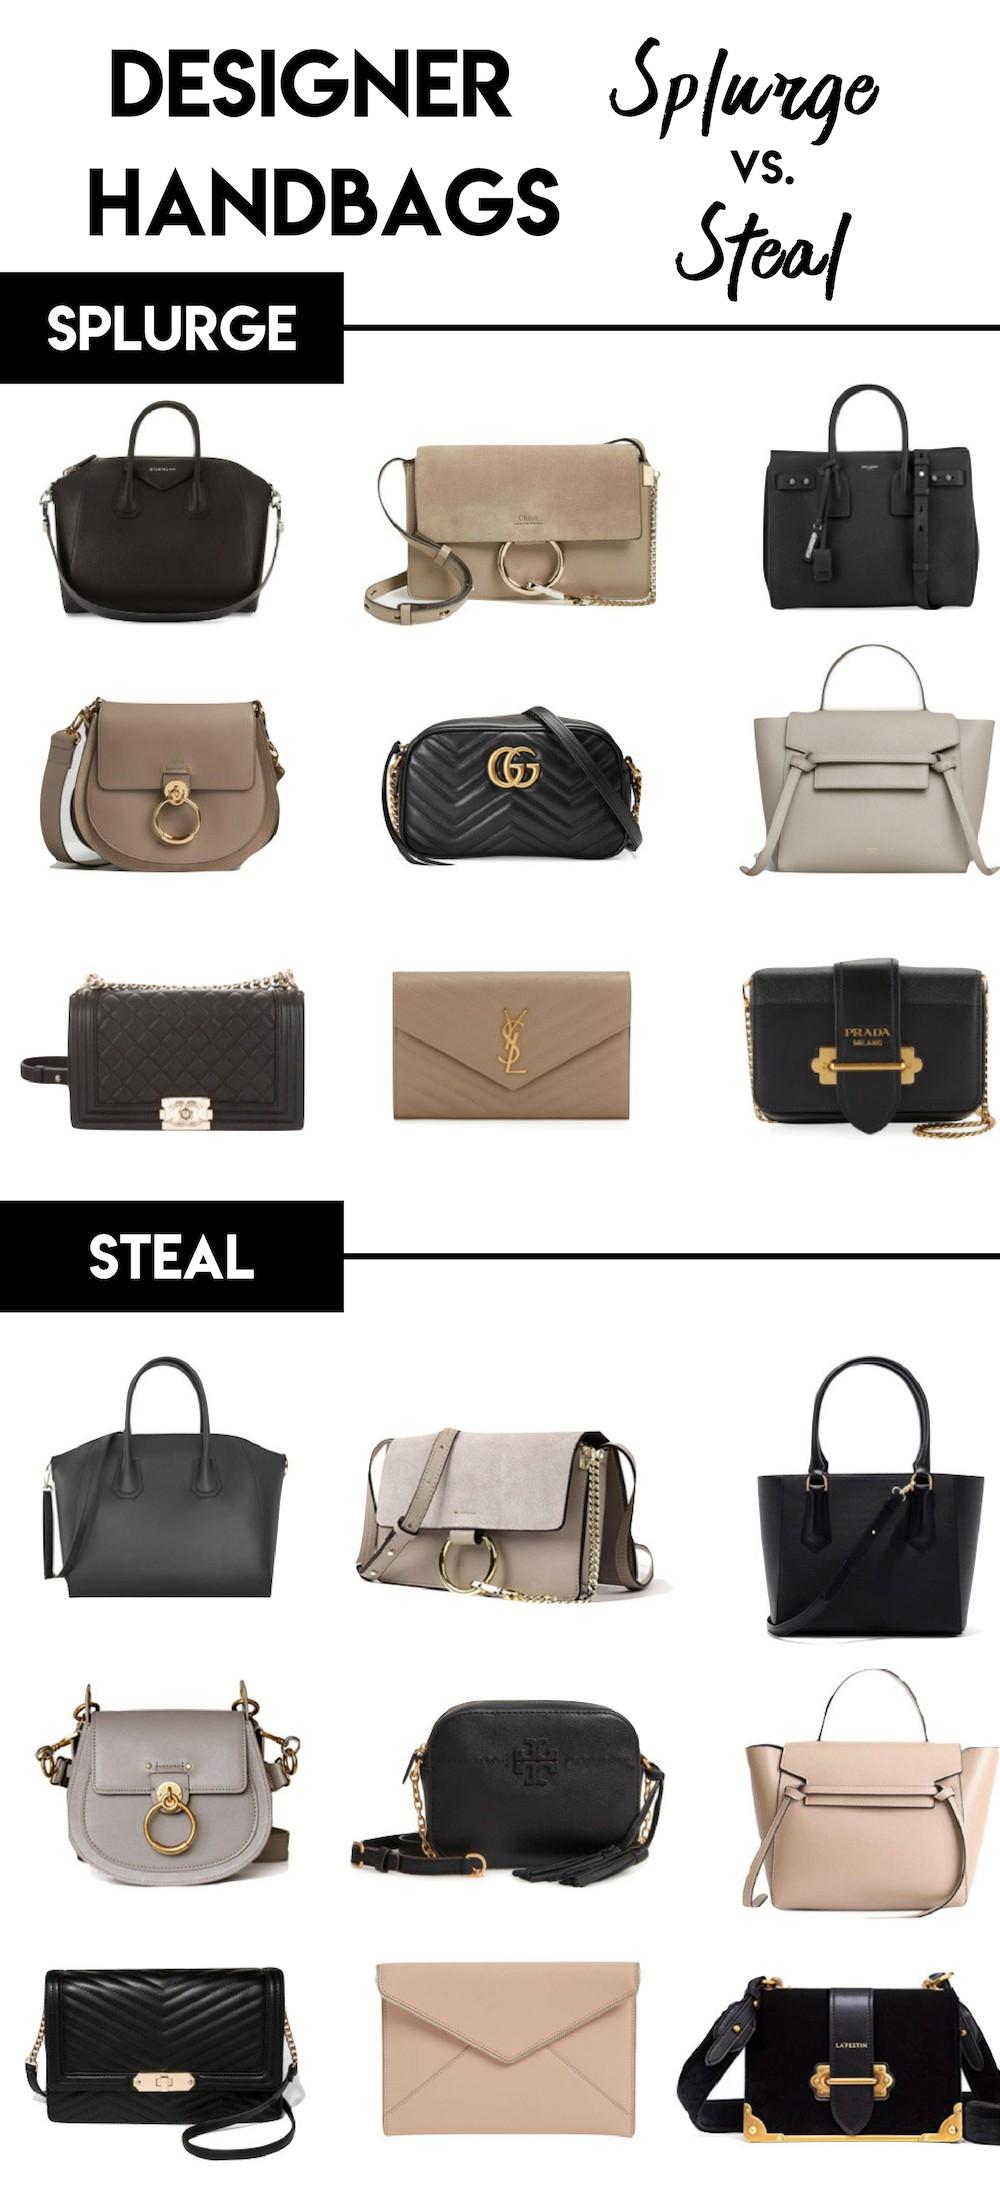 9e7b9baf9fb8 The Best Designer Handbags And Dupes For Less